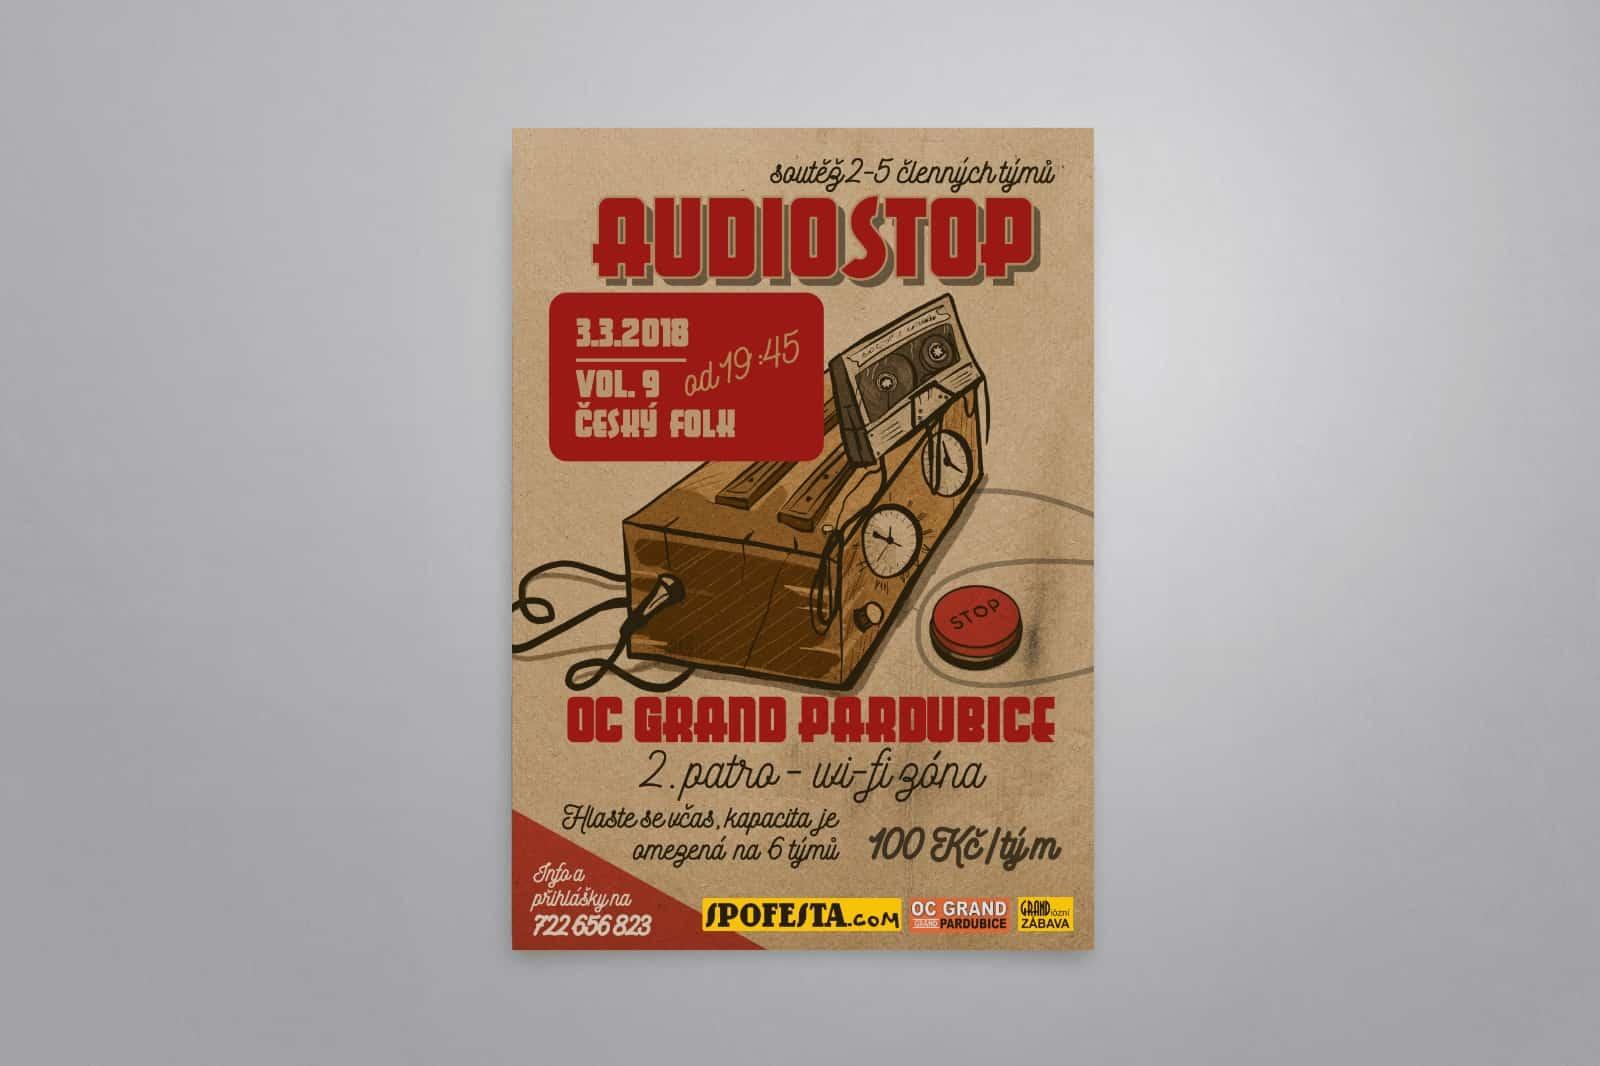 audiostop_poster.jpeg